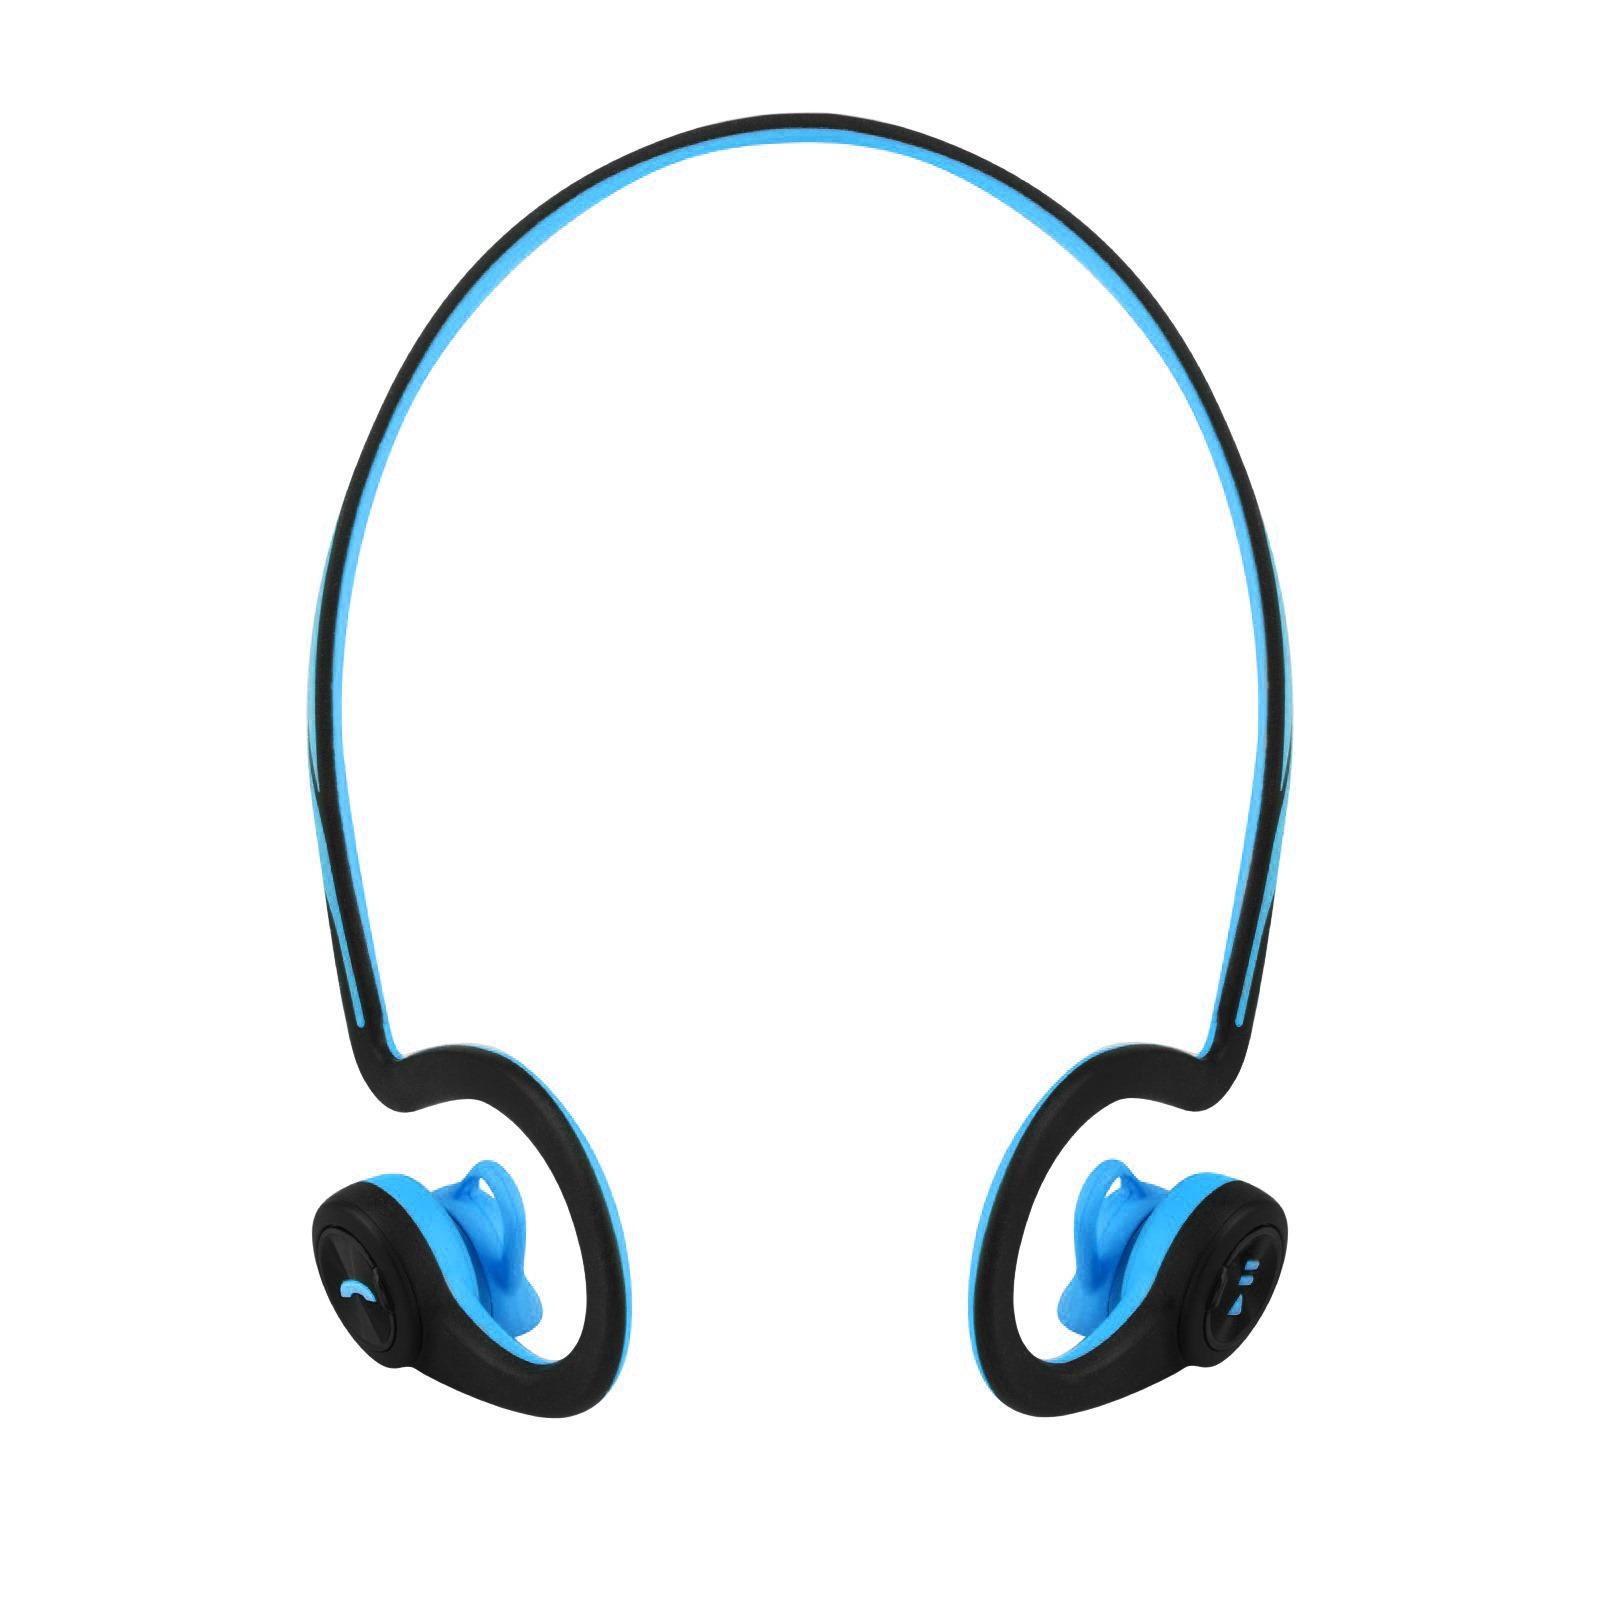 Plantronics bluetooth headphones sport - bluetooth earbuds waterproof plantronics